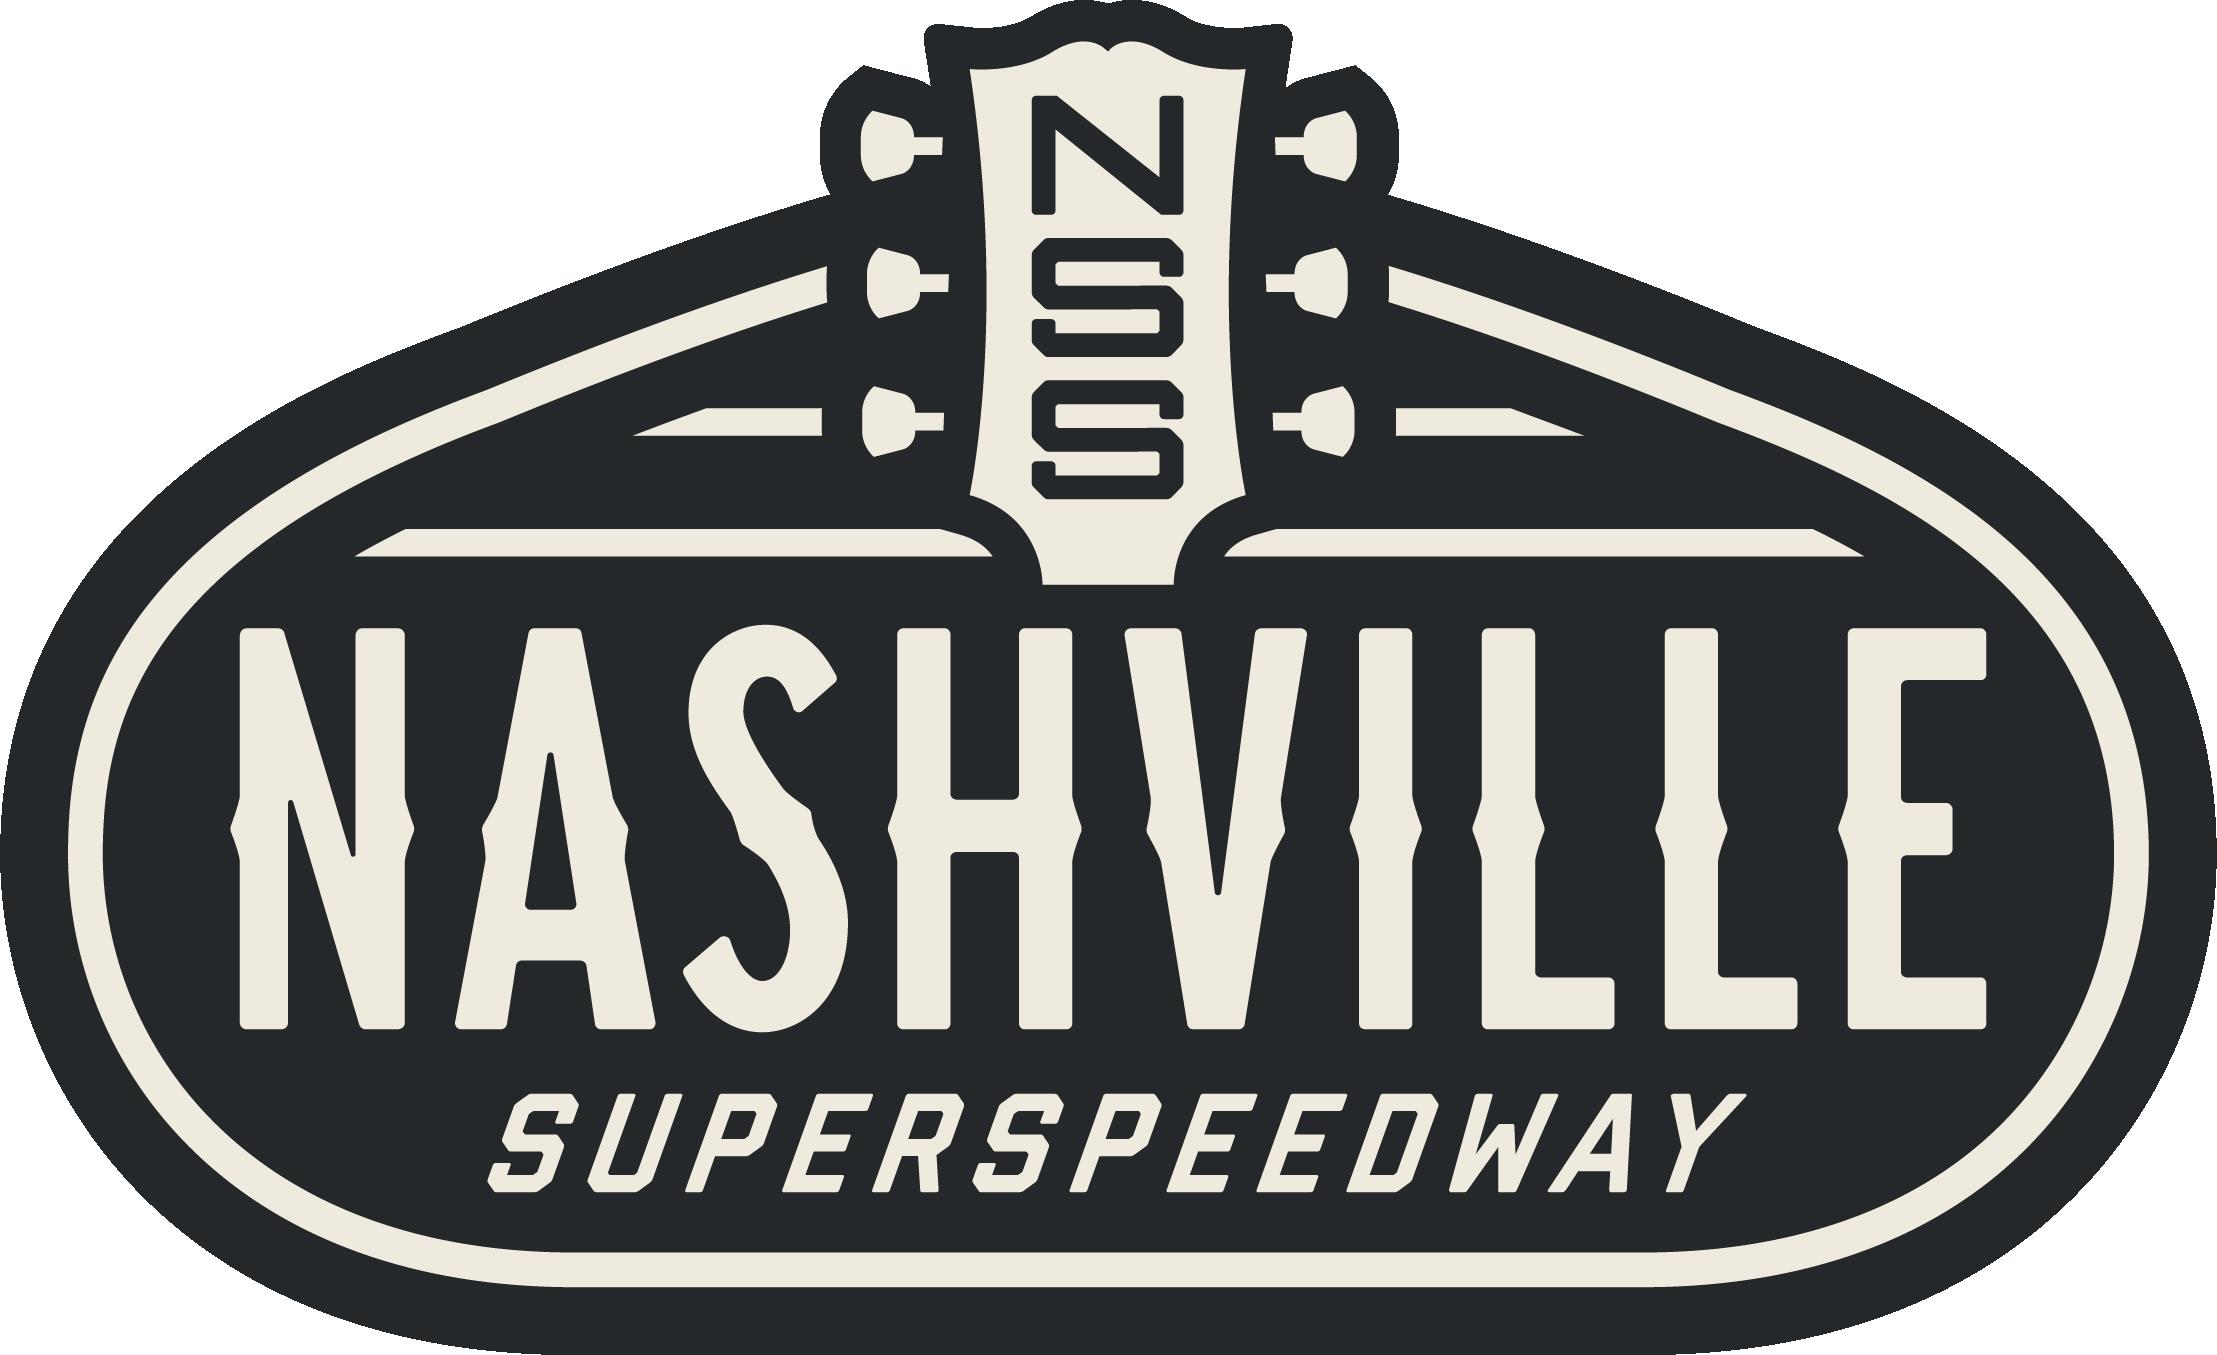 NASCAR Xfinity Series; Nashville Superspeedway